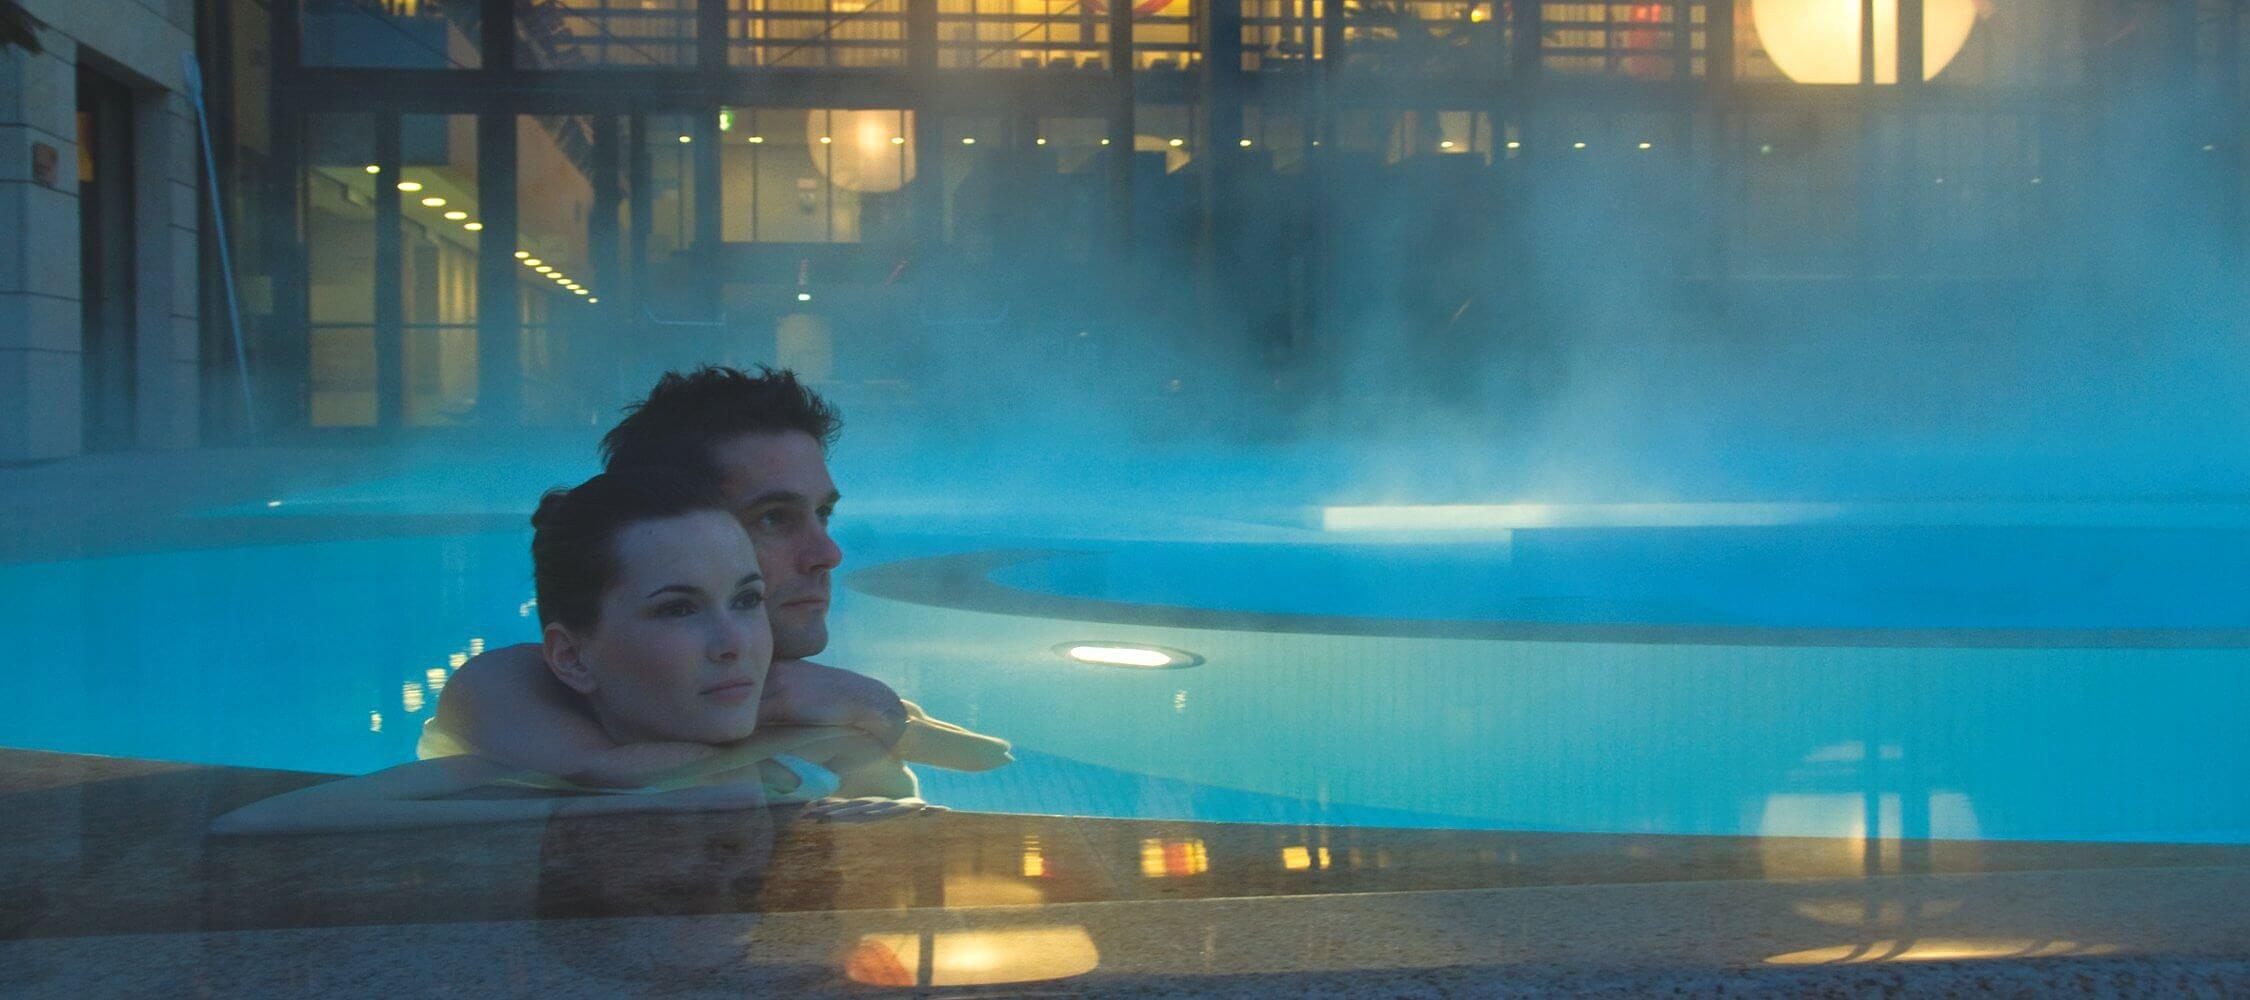 Italien-Trentino_Suedtirol_Alto_Adige_Merano_Meran_Therme_Pool_Badehalle_Schwimmbad_Nacht_Paar_Romantik_Tappeiner_2250x1000